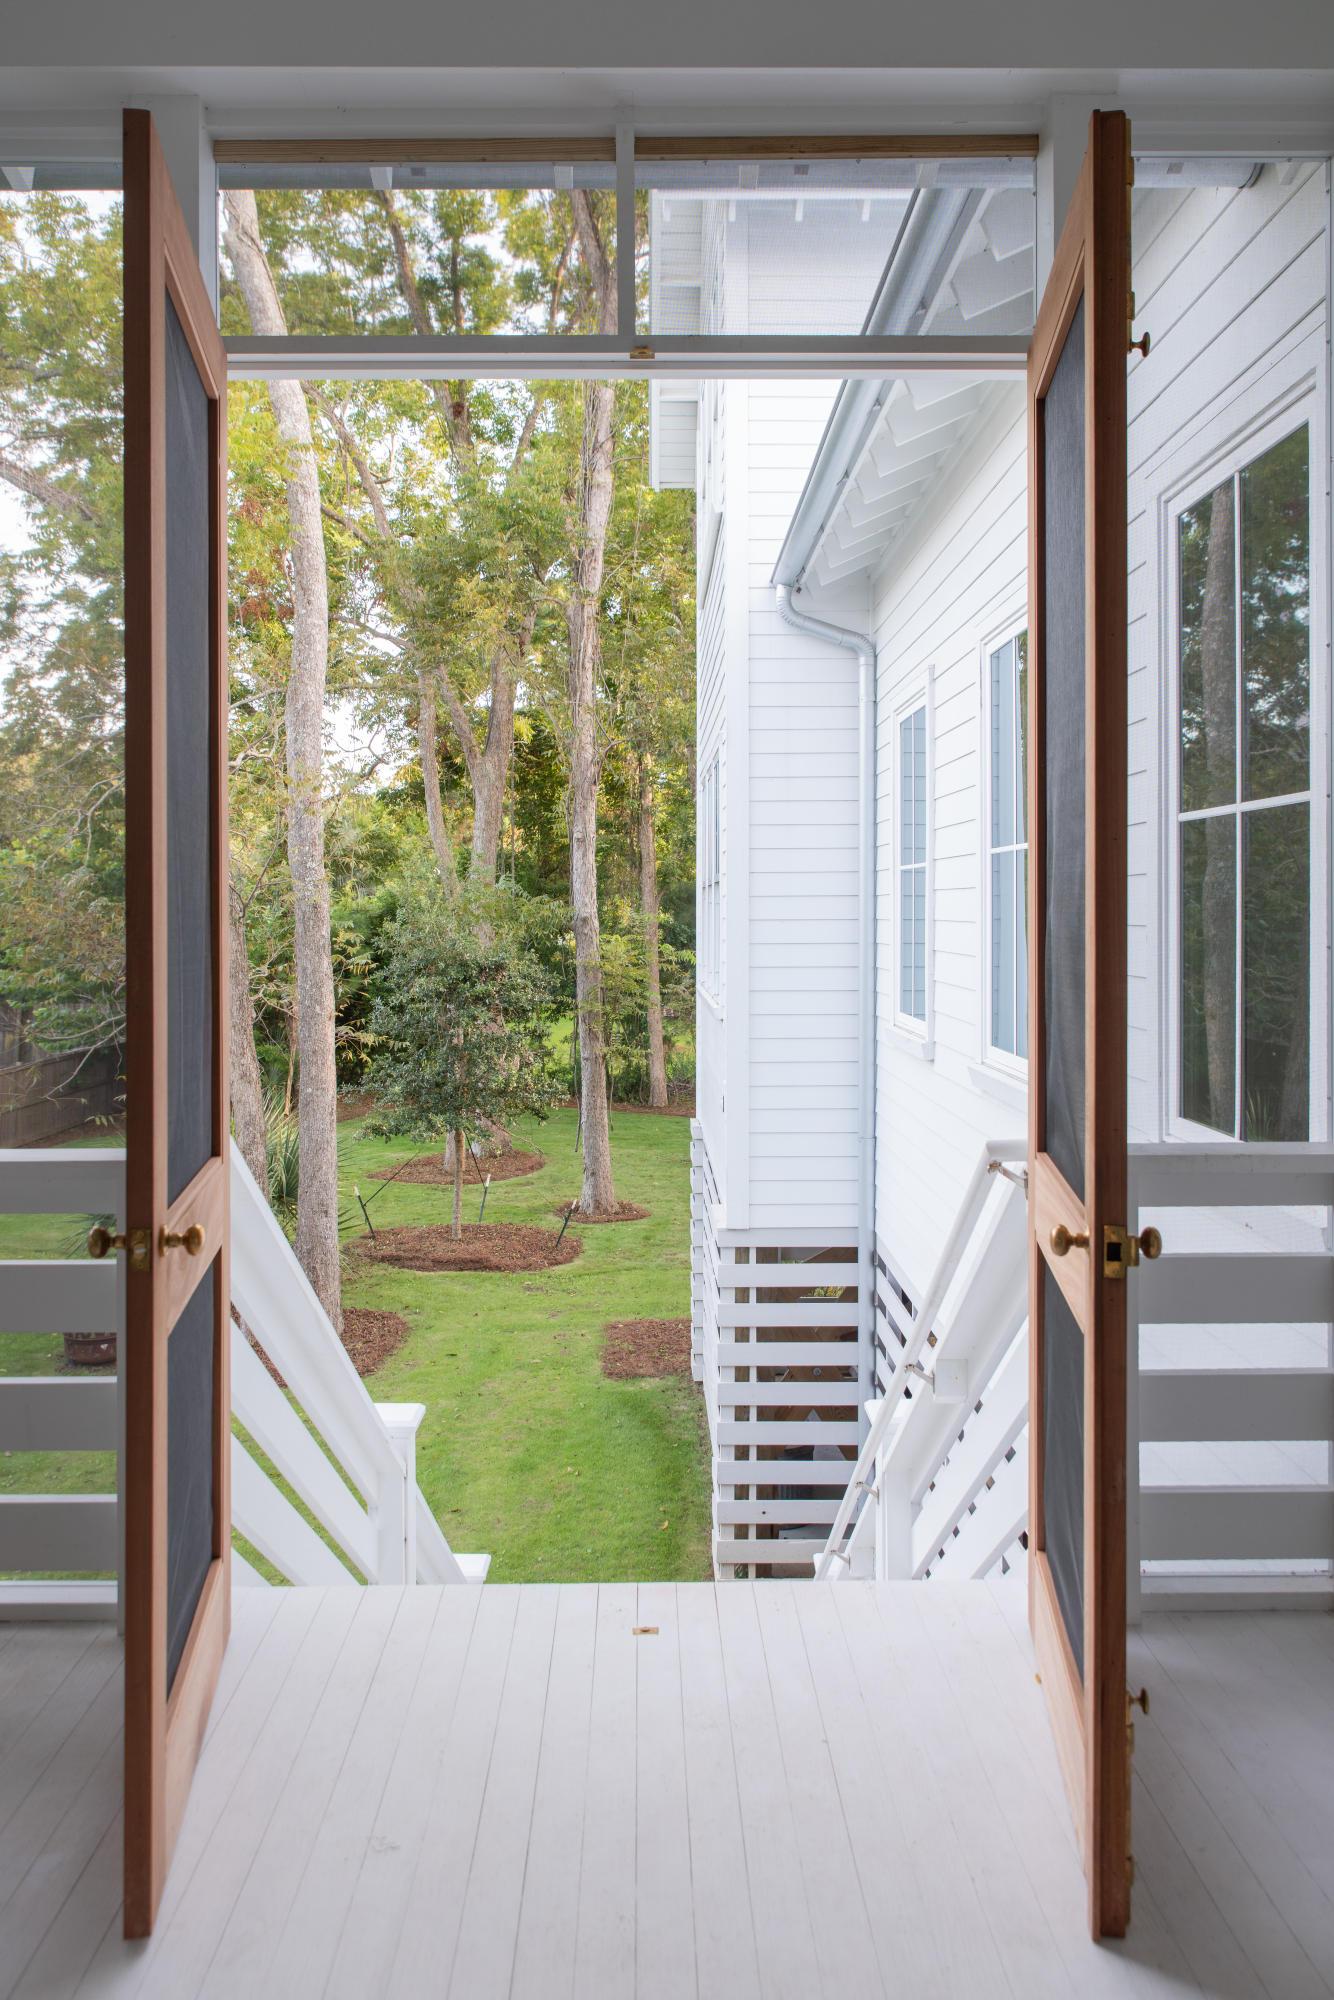 Scanlonville Homes For Sale - 181 5th, Mount Pleasant, SC - 30